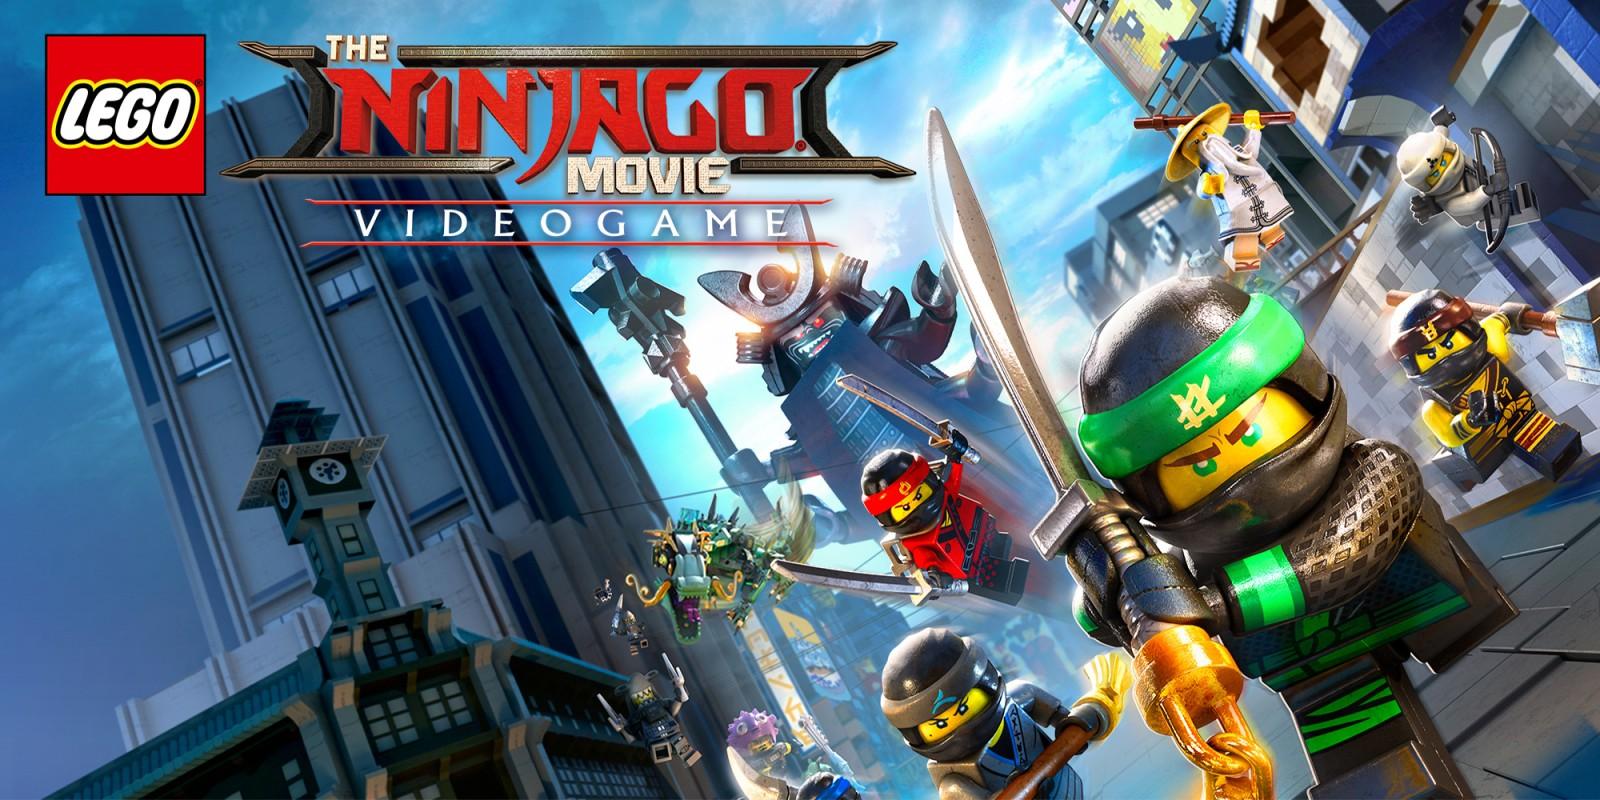 lego174 ninjago174 le film le jeu vid233o nintendo switch